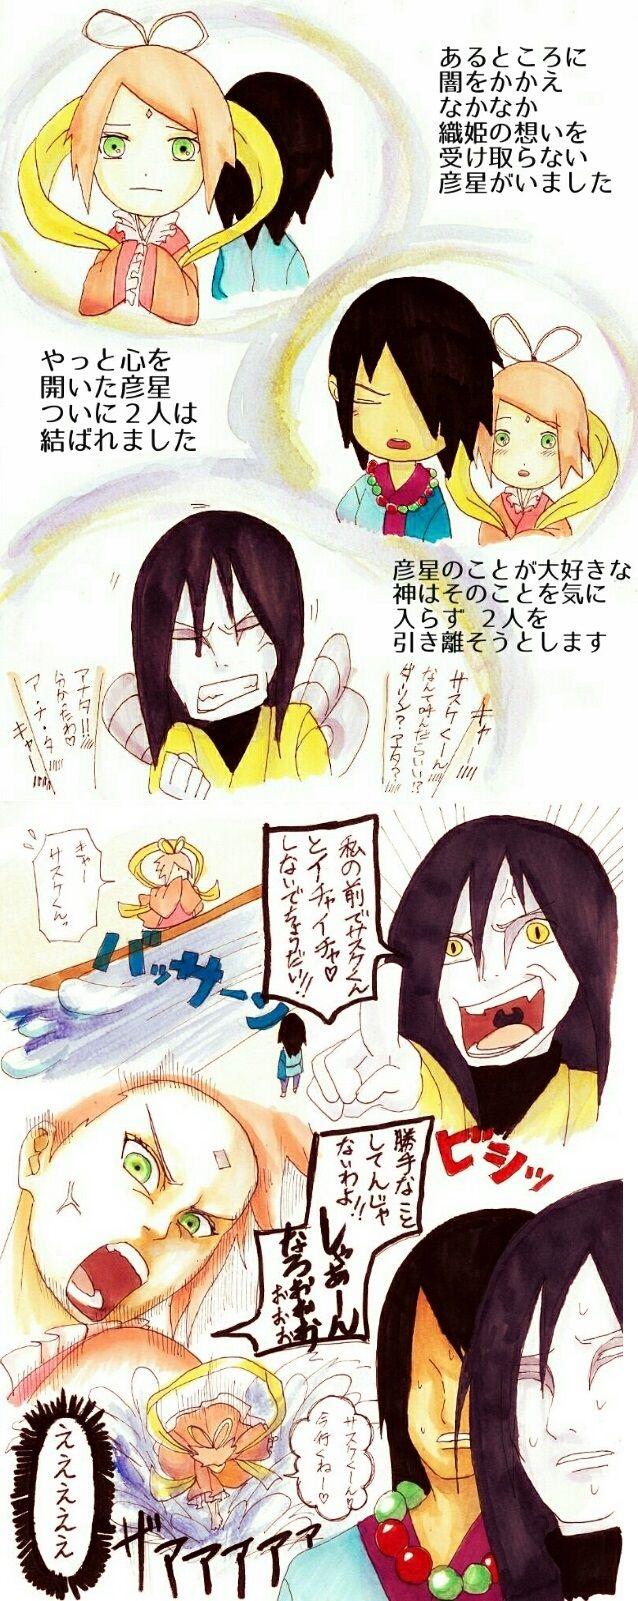 F A Cf Ad C A Bd Da C A Naruto Pics Naruto Art also Sasukeuchiha further Df A D Eed B F Eac D furthermore B B Cadb Adc Ac likewise F Aac Bae B Db C D A F D. on naruto shippuden ideas